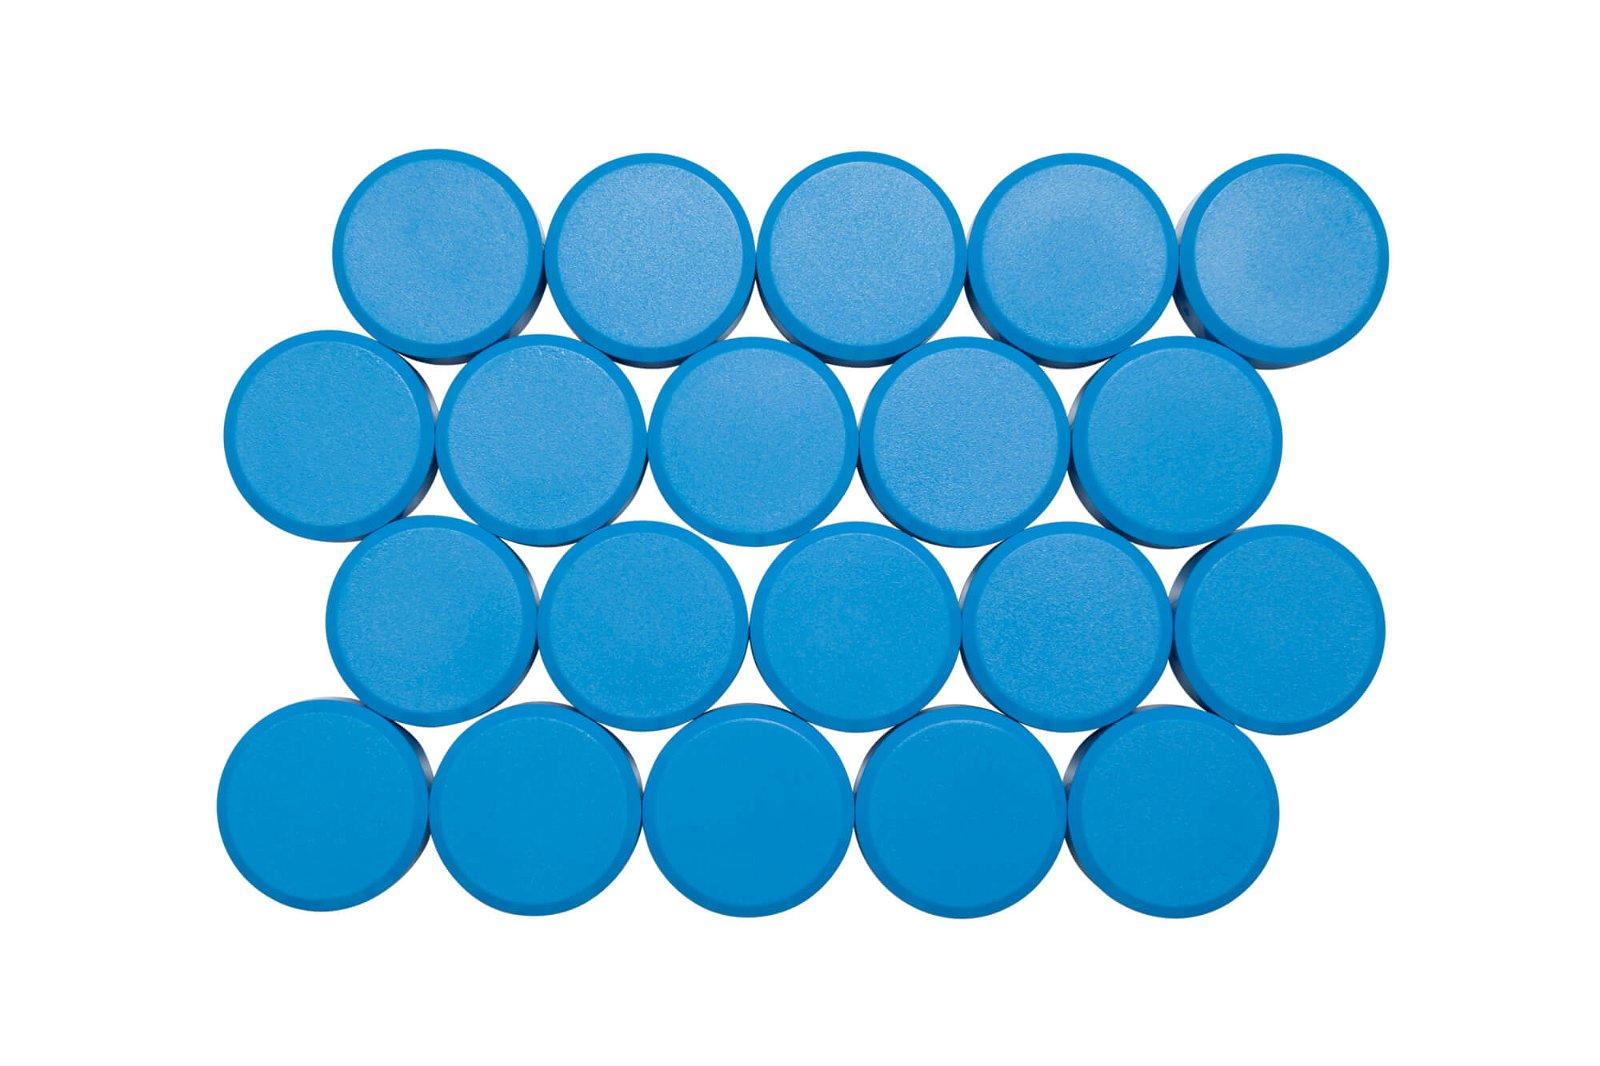 Facetterand-Magnet MAULpro Ø 30 mm, 0,6 kg, 20 St./Set, hellblau